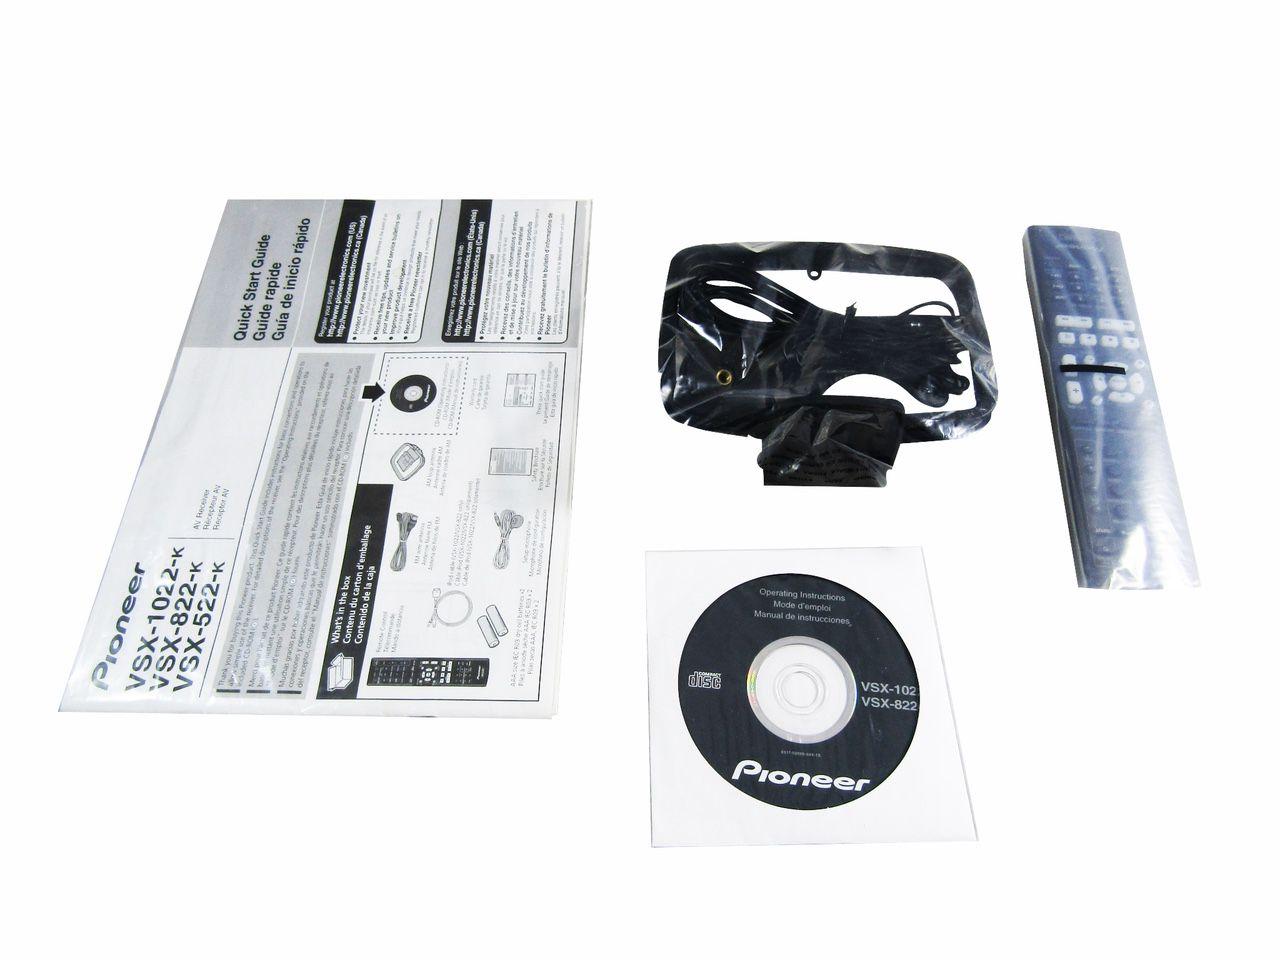 Pioneer VSX-822-K 5.1-Channel Network Ready A/V Receiver LN